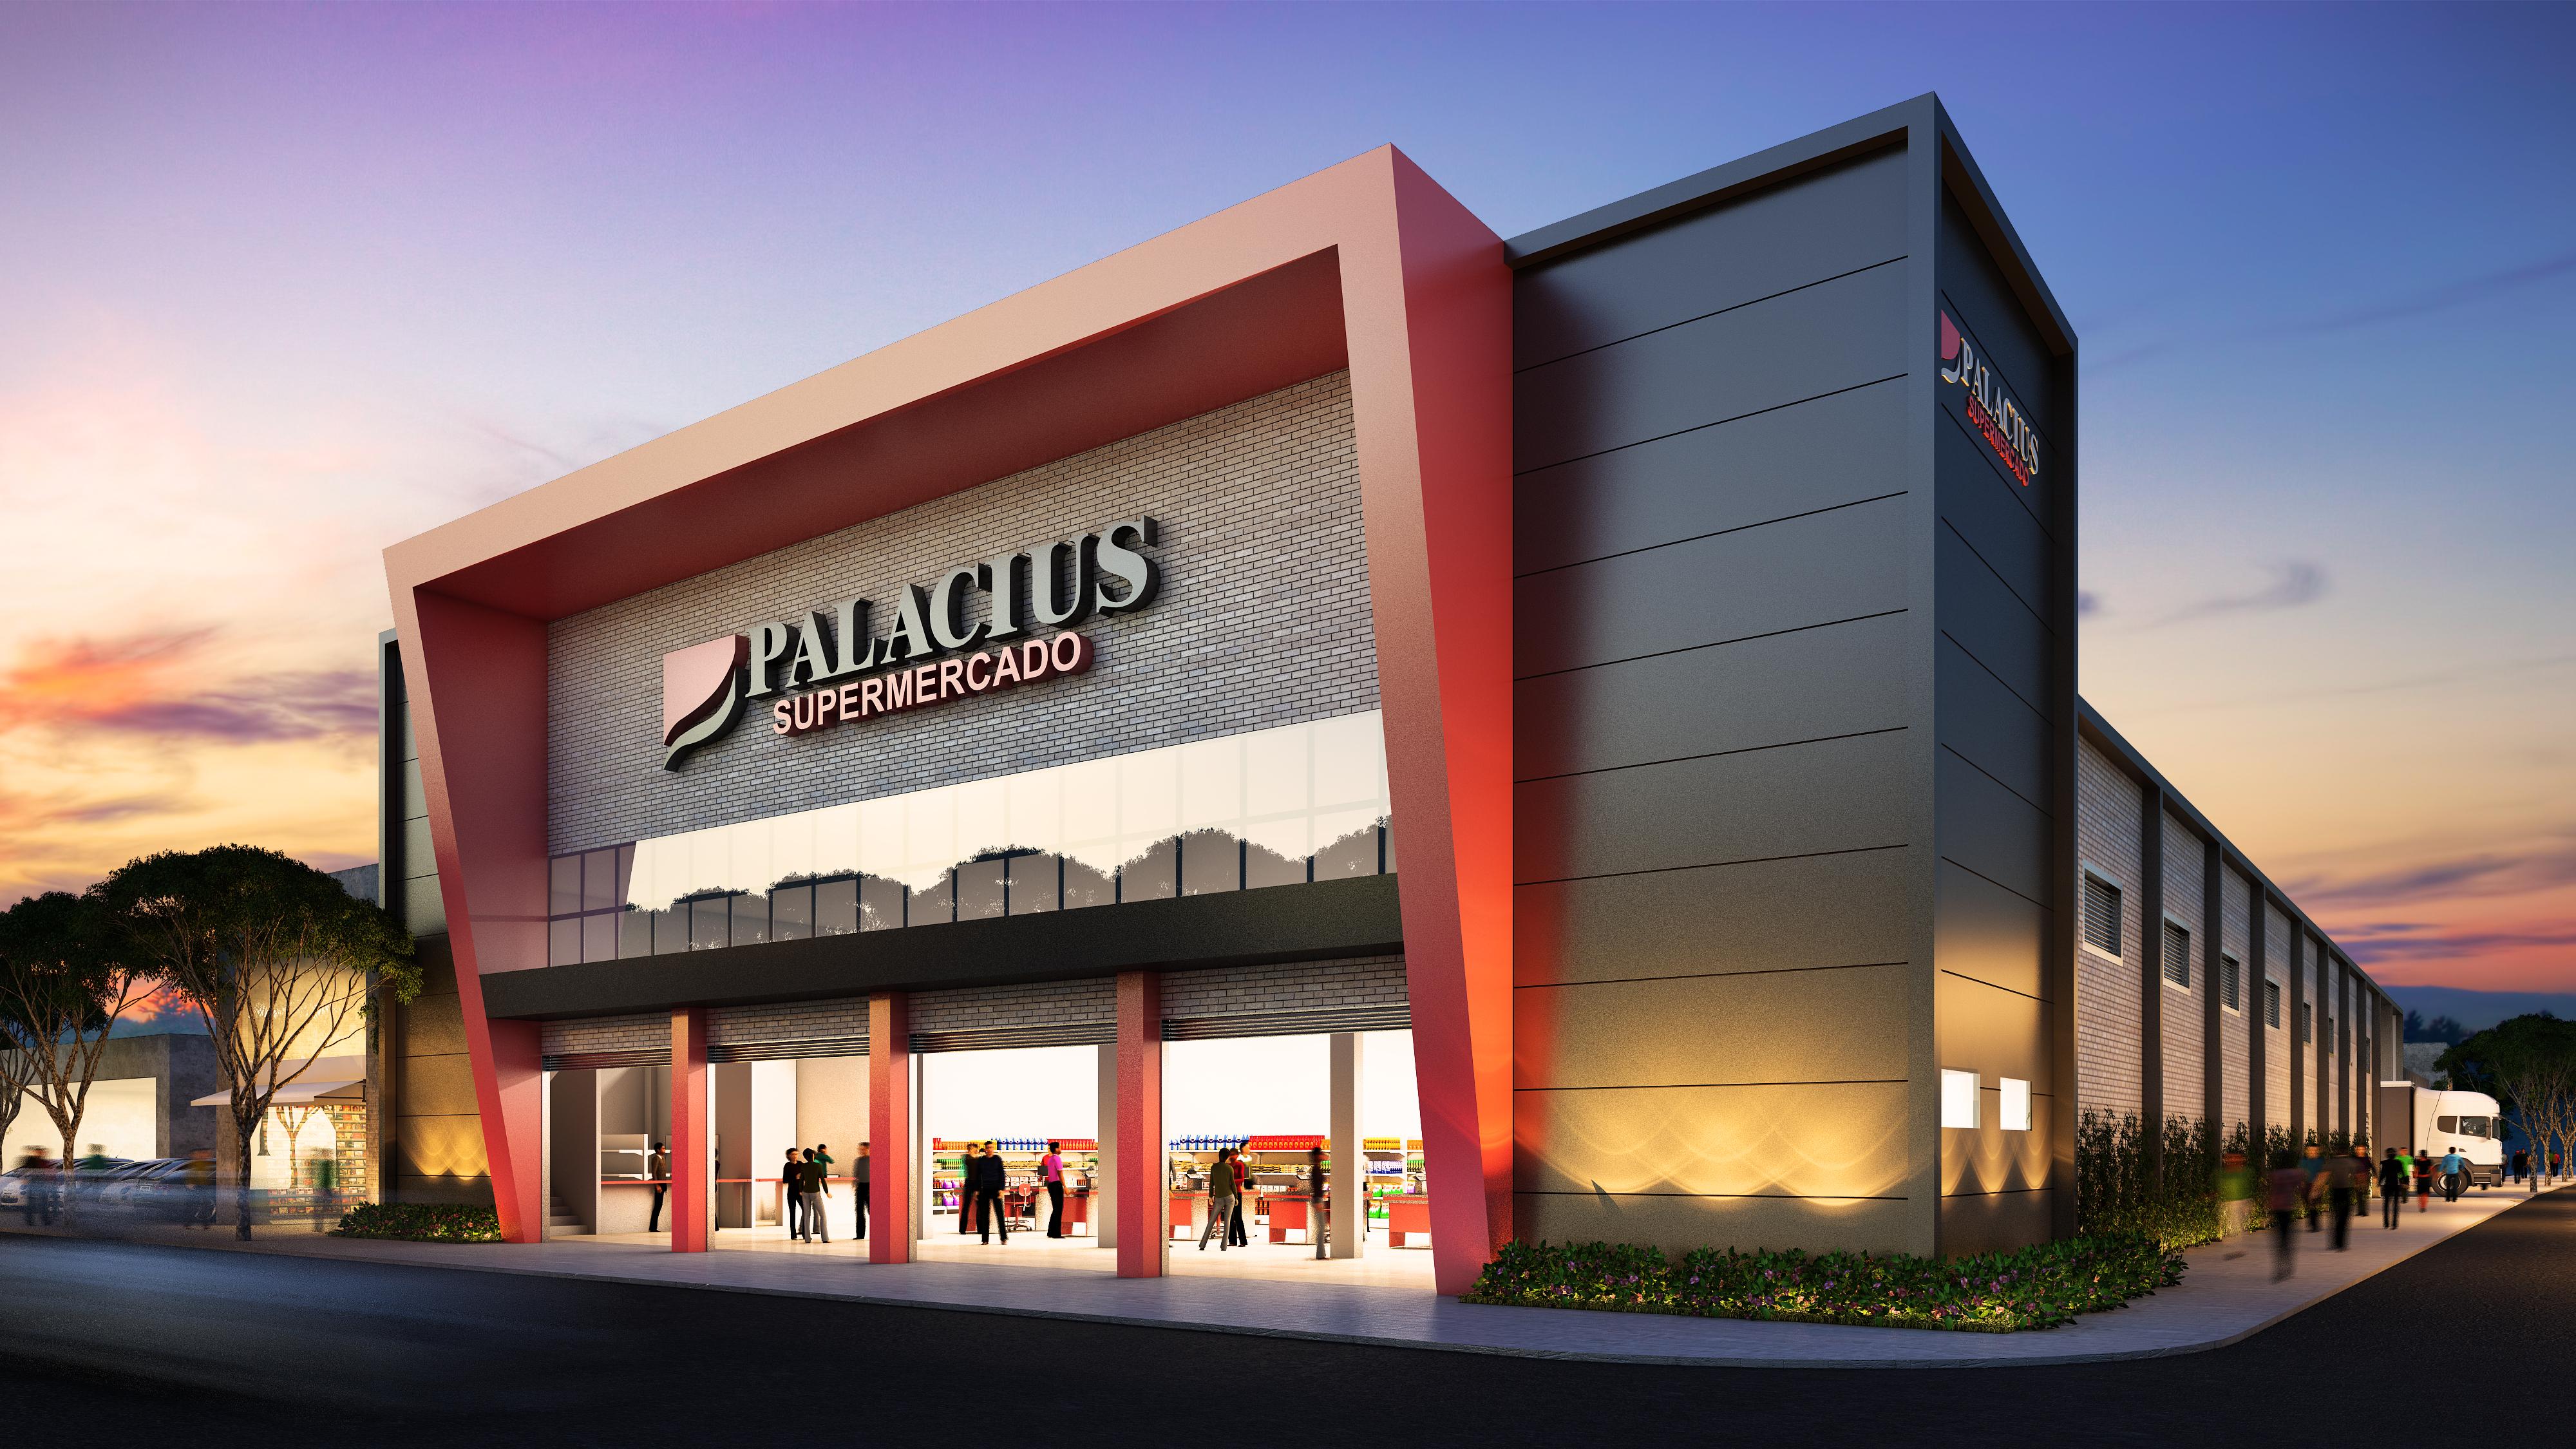 Supermercado Palacius